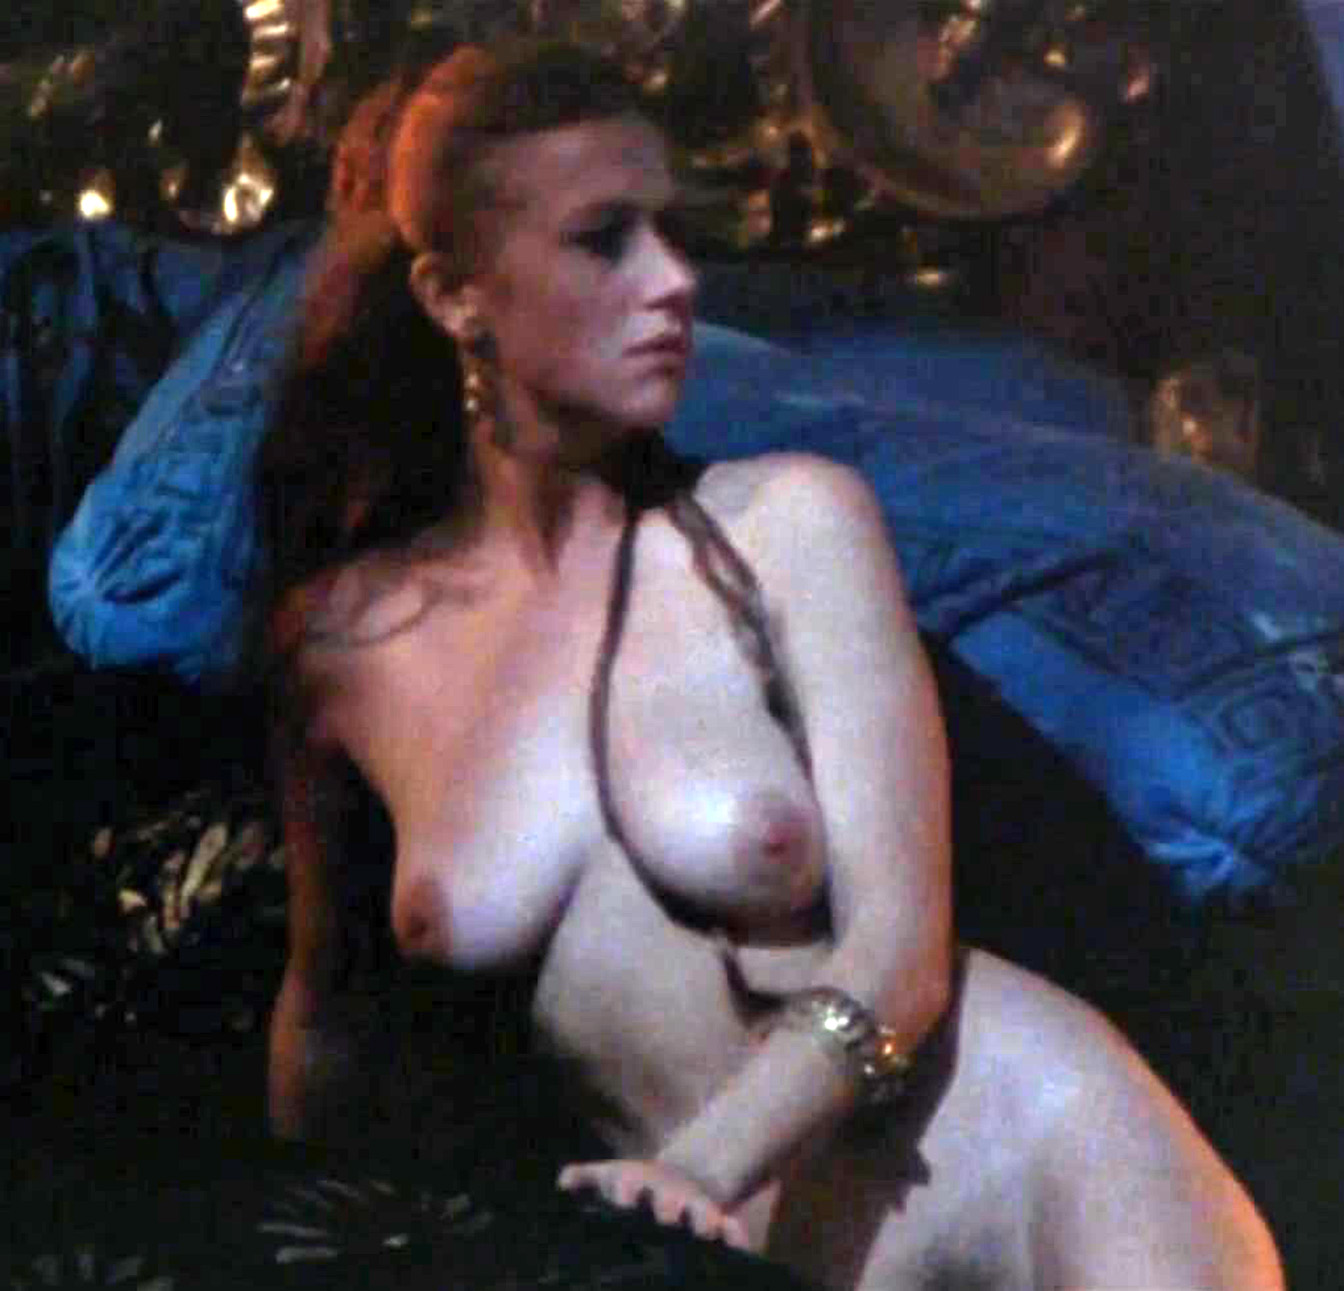 Sexy Korean Woman Naked Sexy Pron Fuck Neked Hd Wallpaper